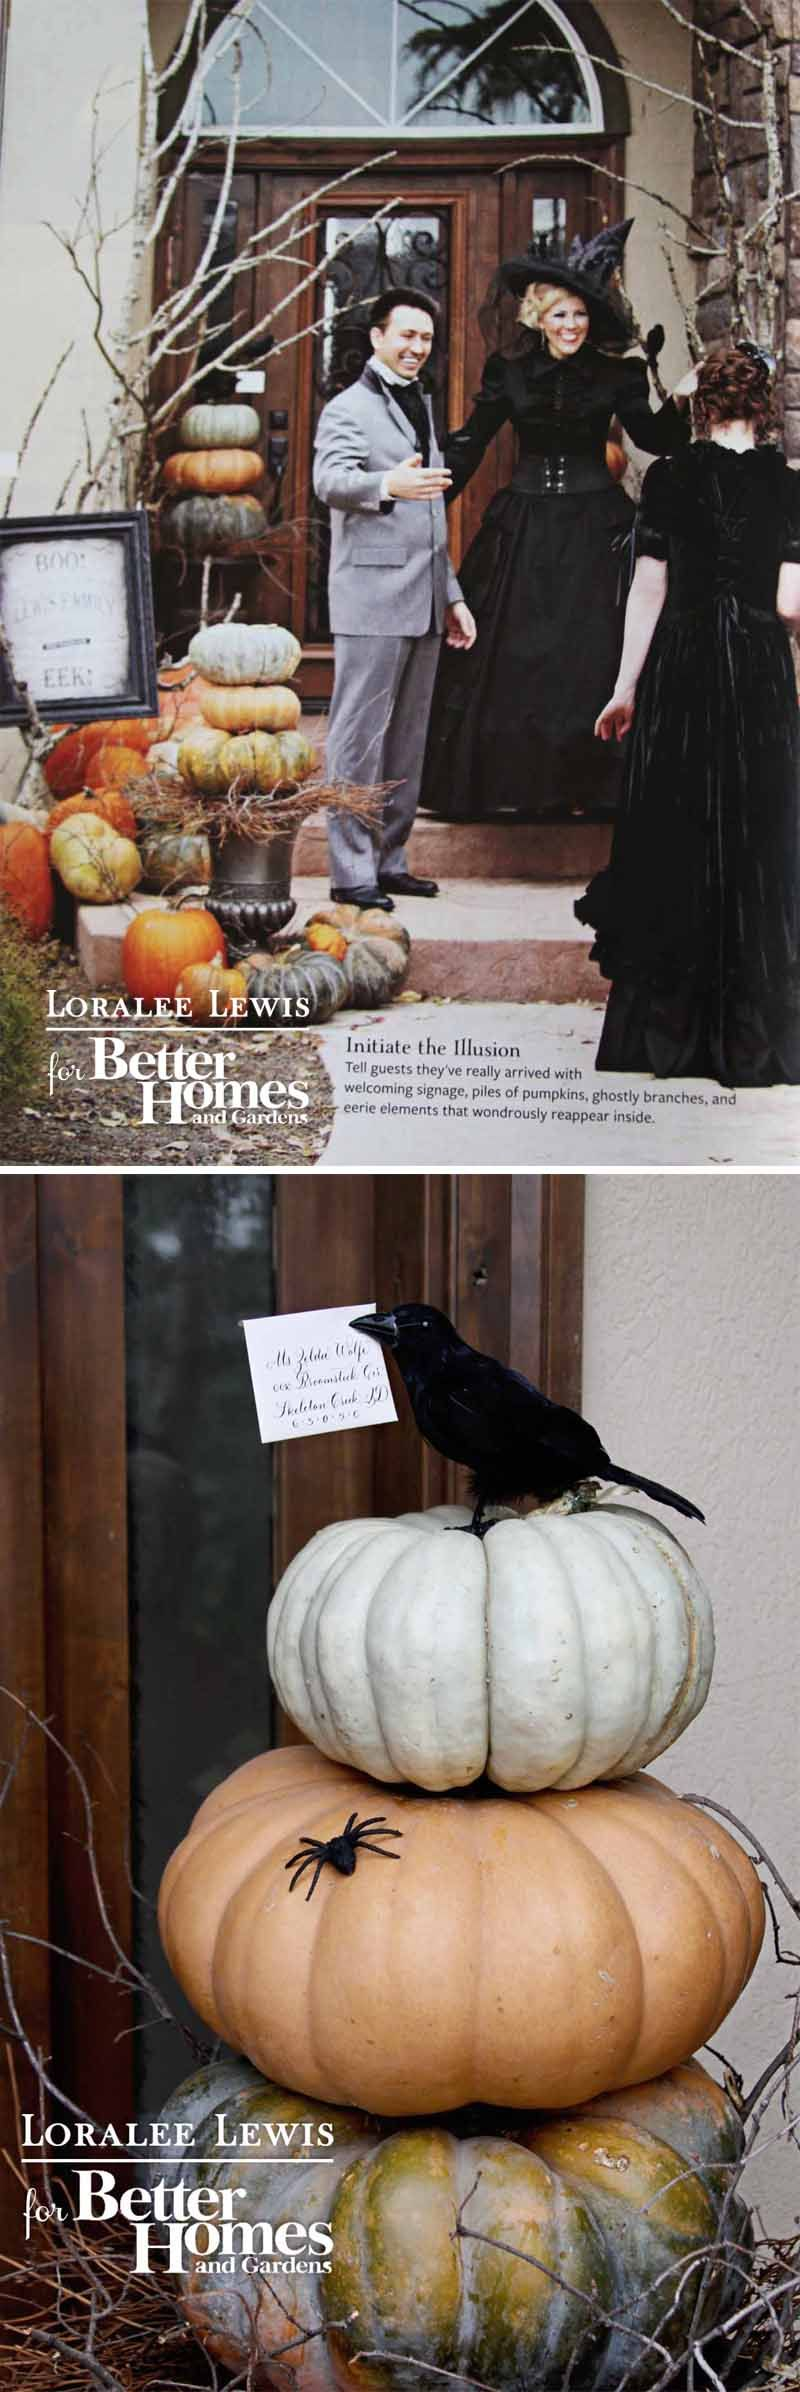 99d1f58381f443006b5965d99230cd82 - Better Homes And Gardens Halloween Tricks And Treats Magazine 2017